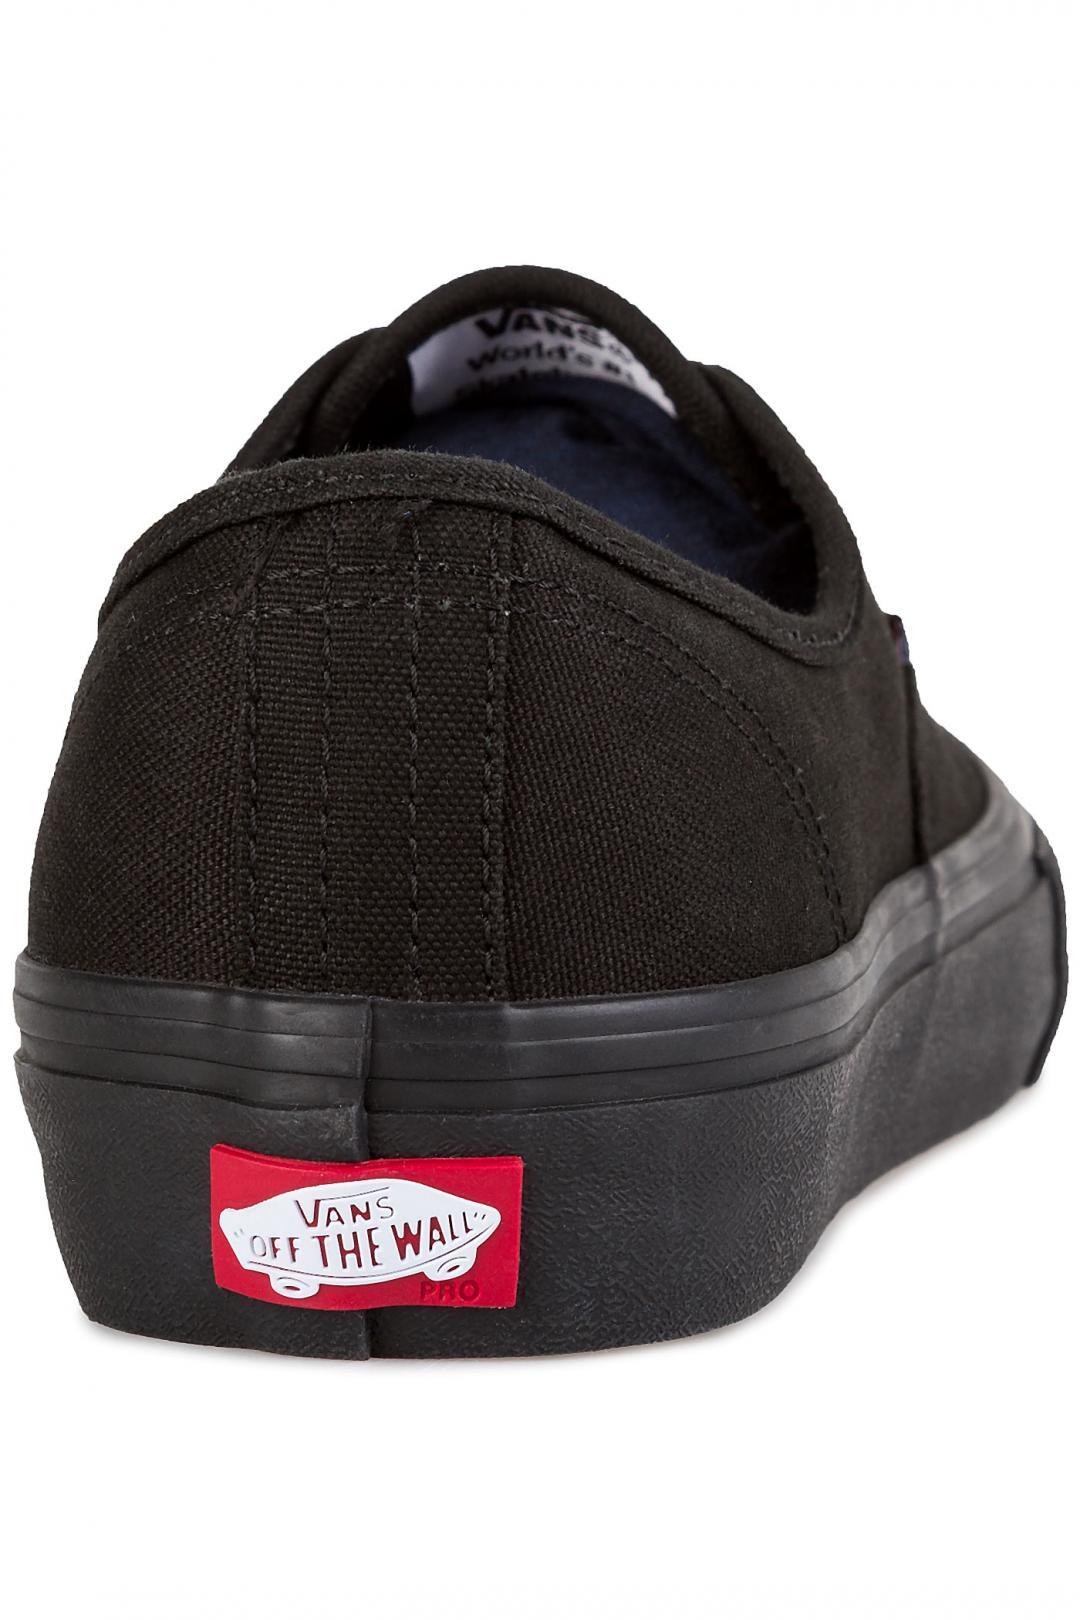 Uomo Vans Authentic Pro black black | Sneaker